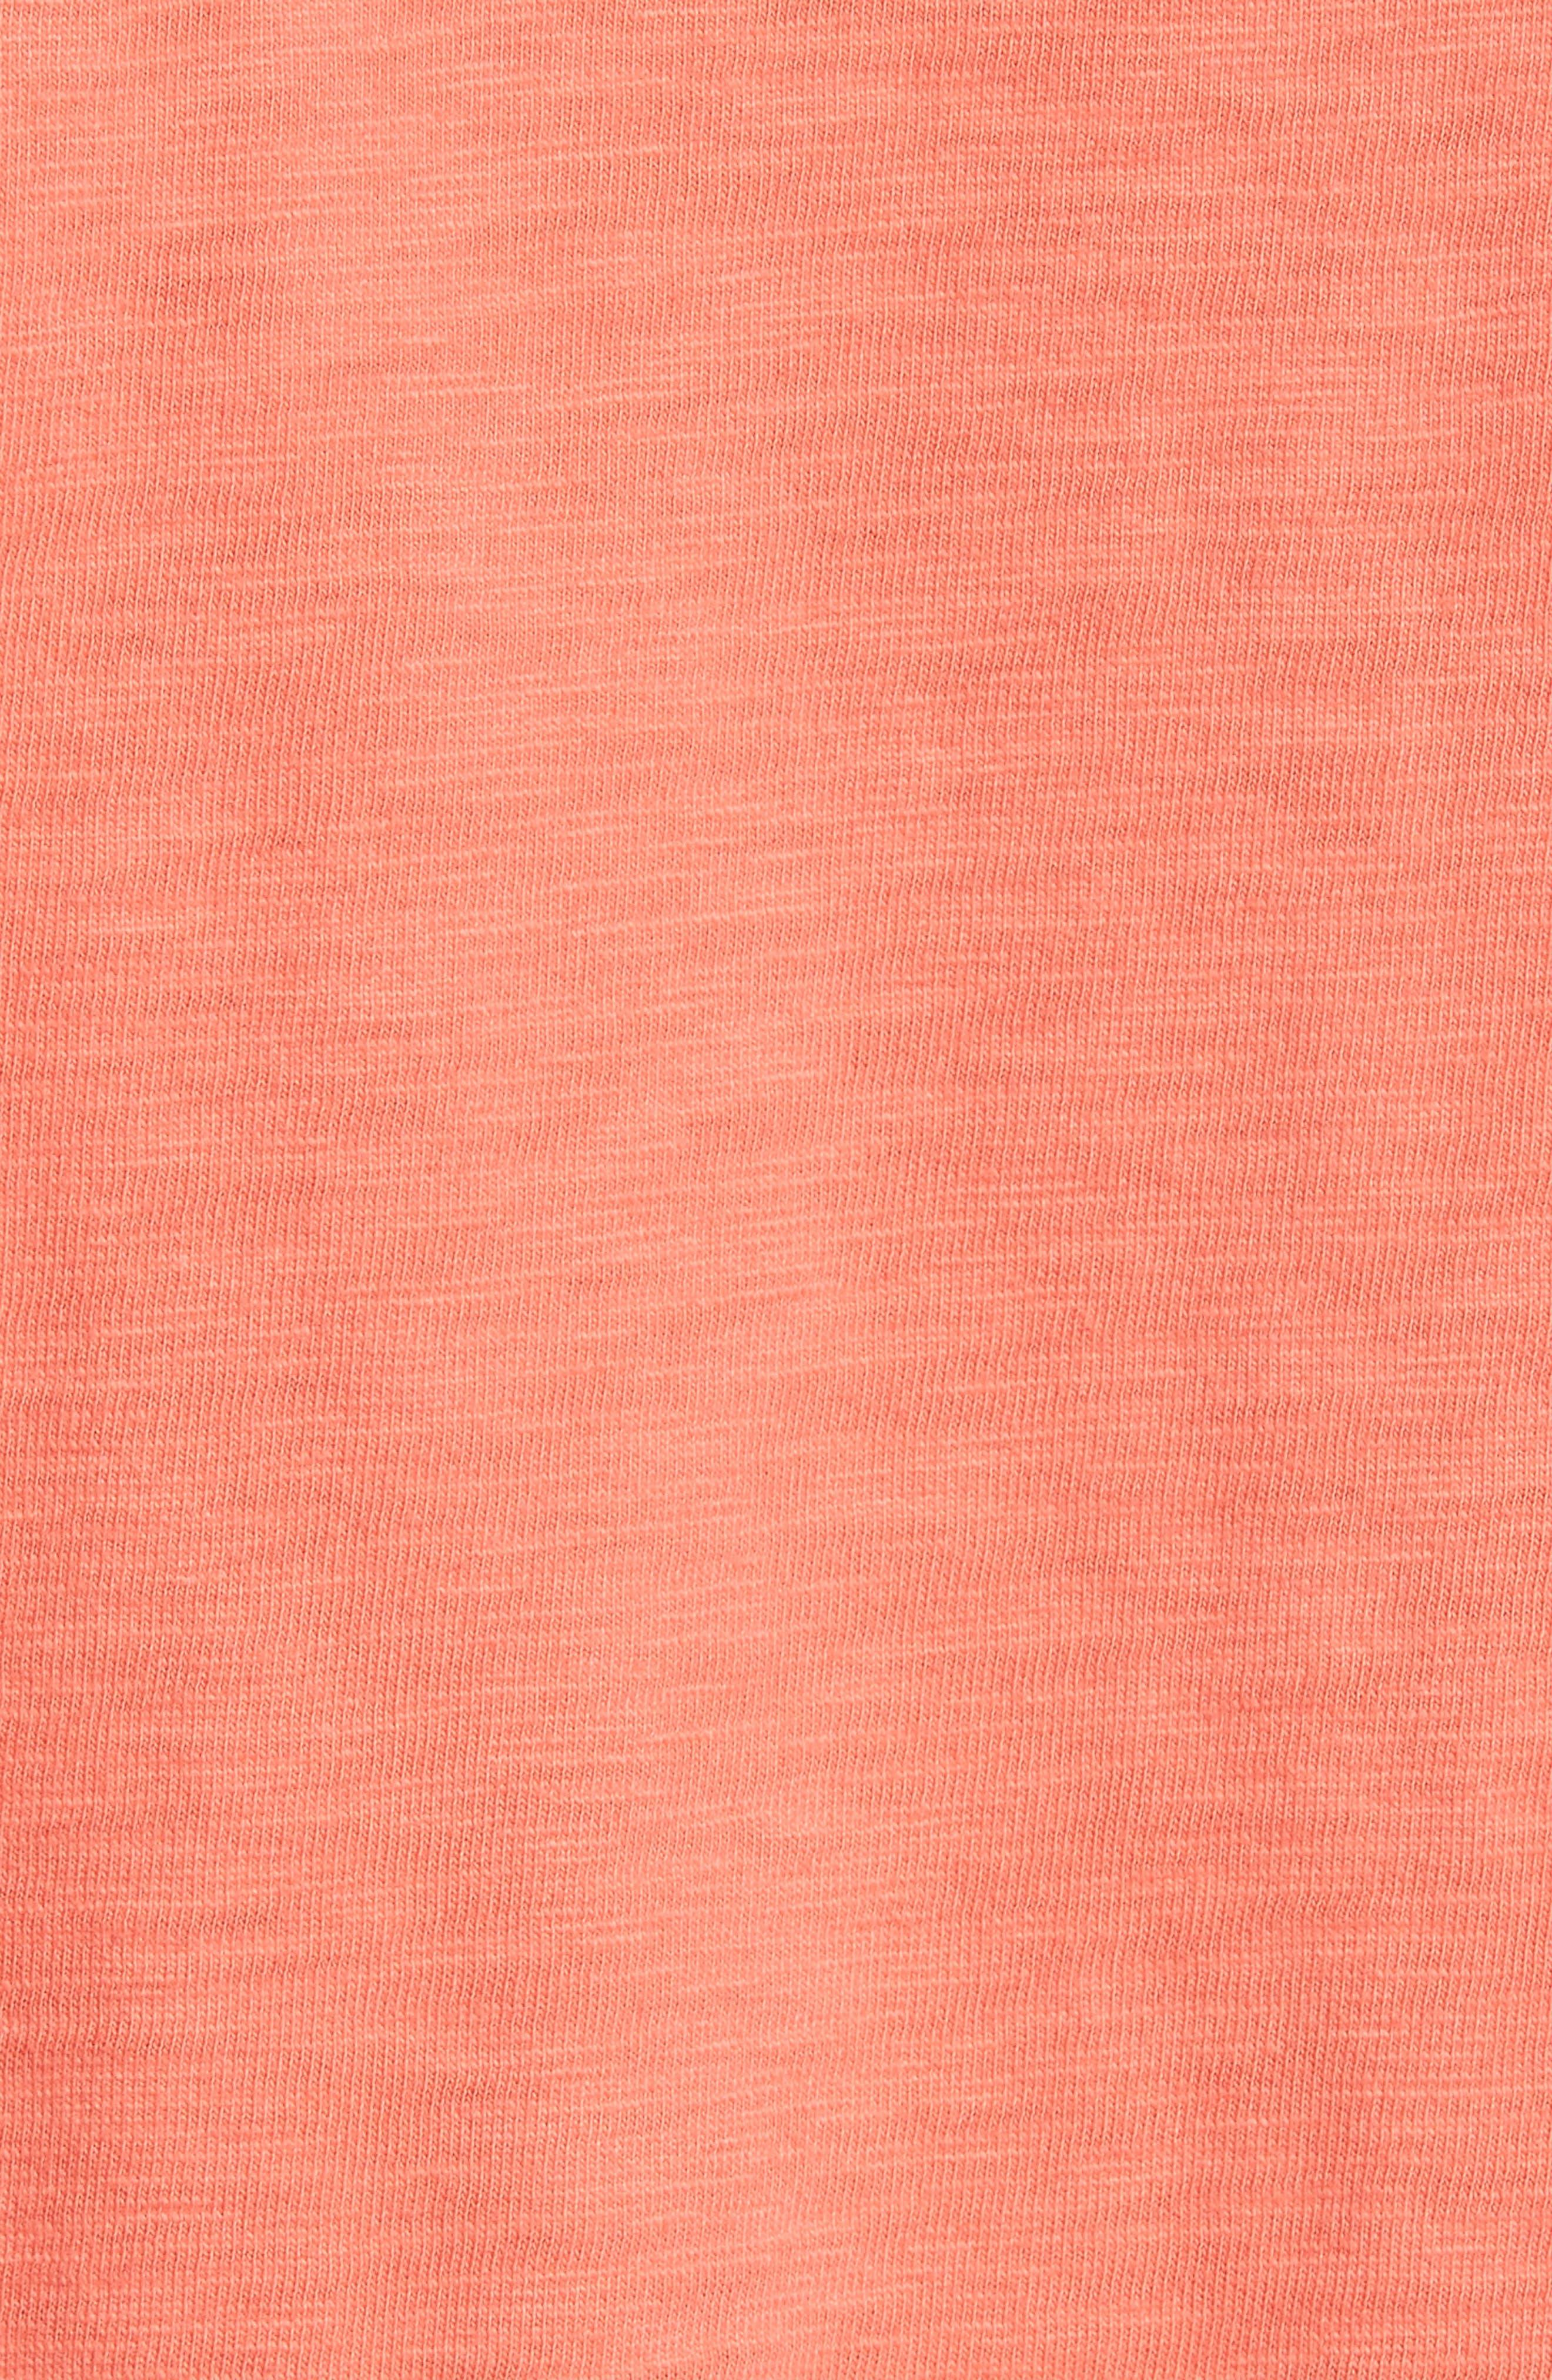 Gulf Stream Sweatshirt,                             Alternate thumbnail 5, color,                             Melon